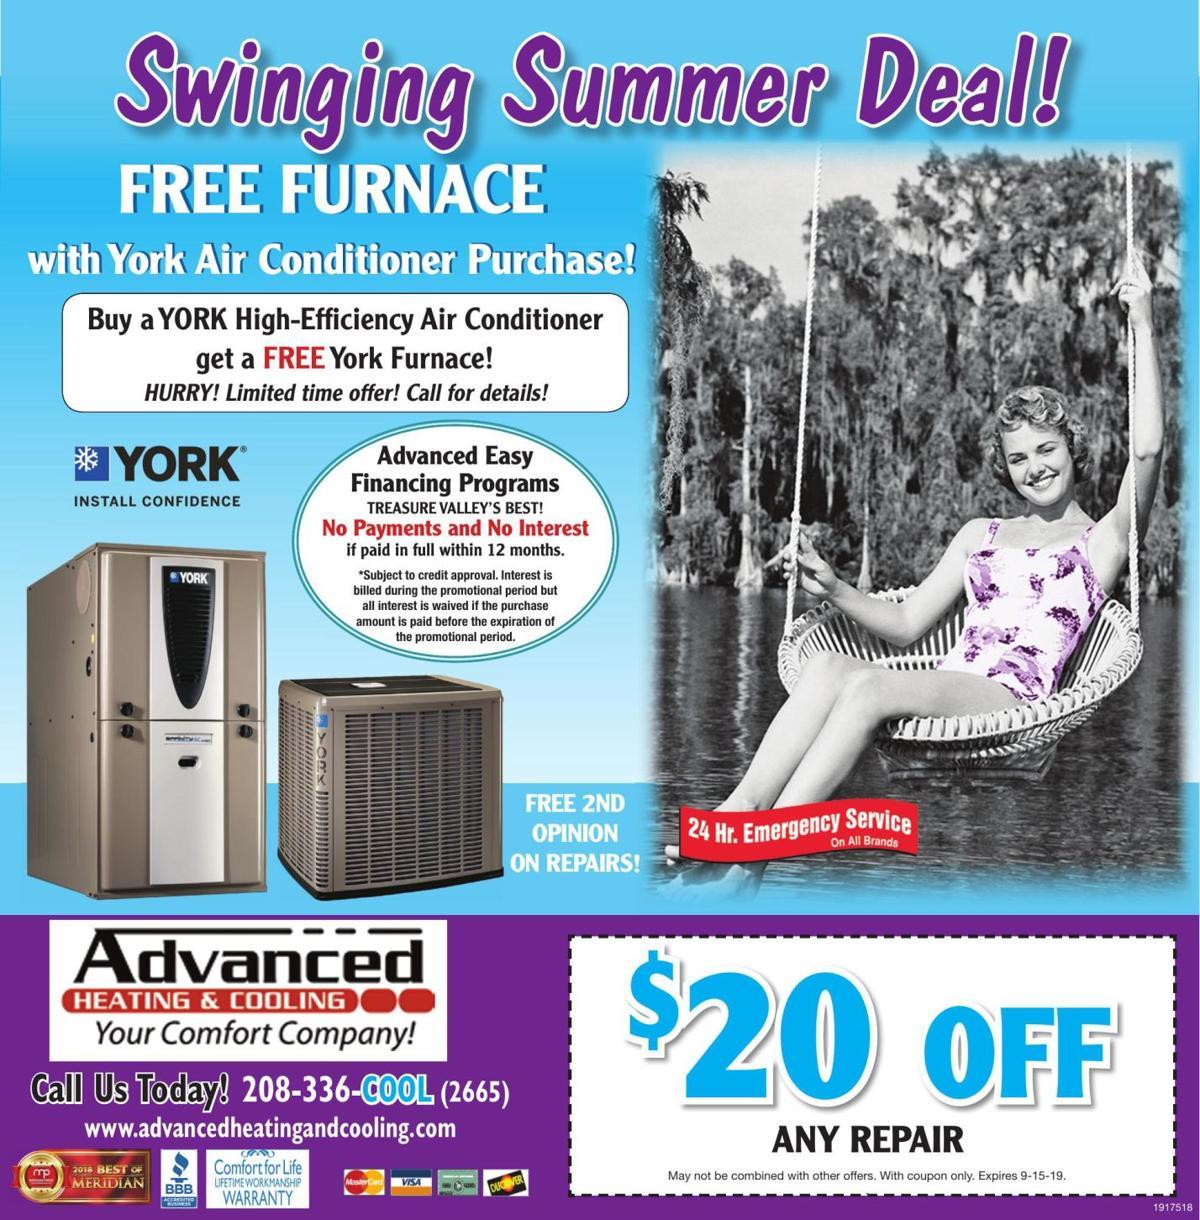 Swinging Summer Deal!